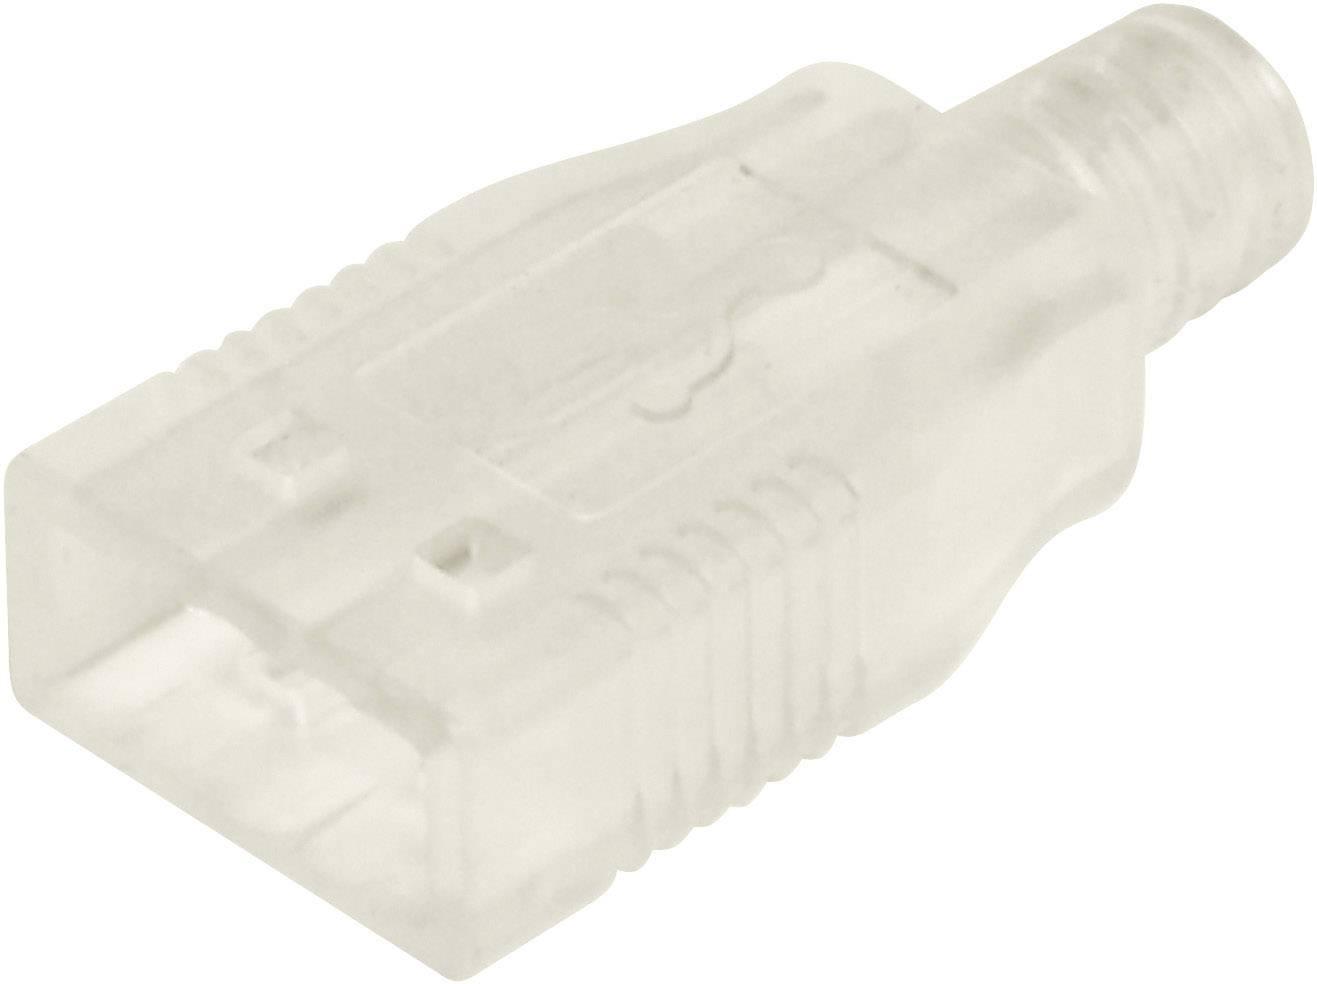 USB 2.0 zástrčka, rovná BKL Electronic N/A 10120100, 1 ks